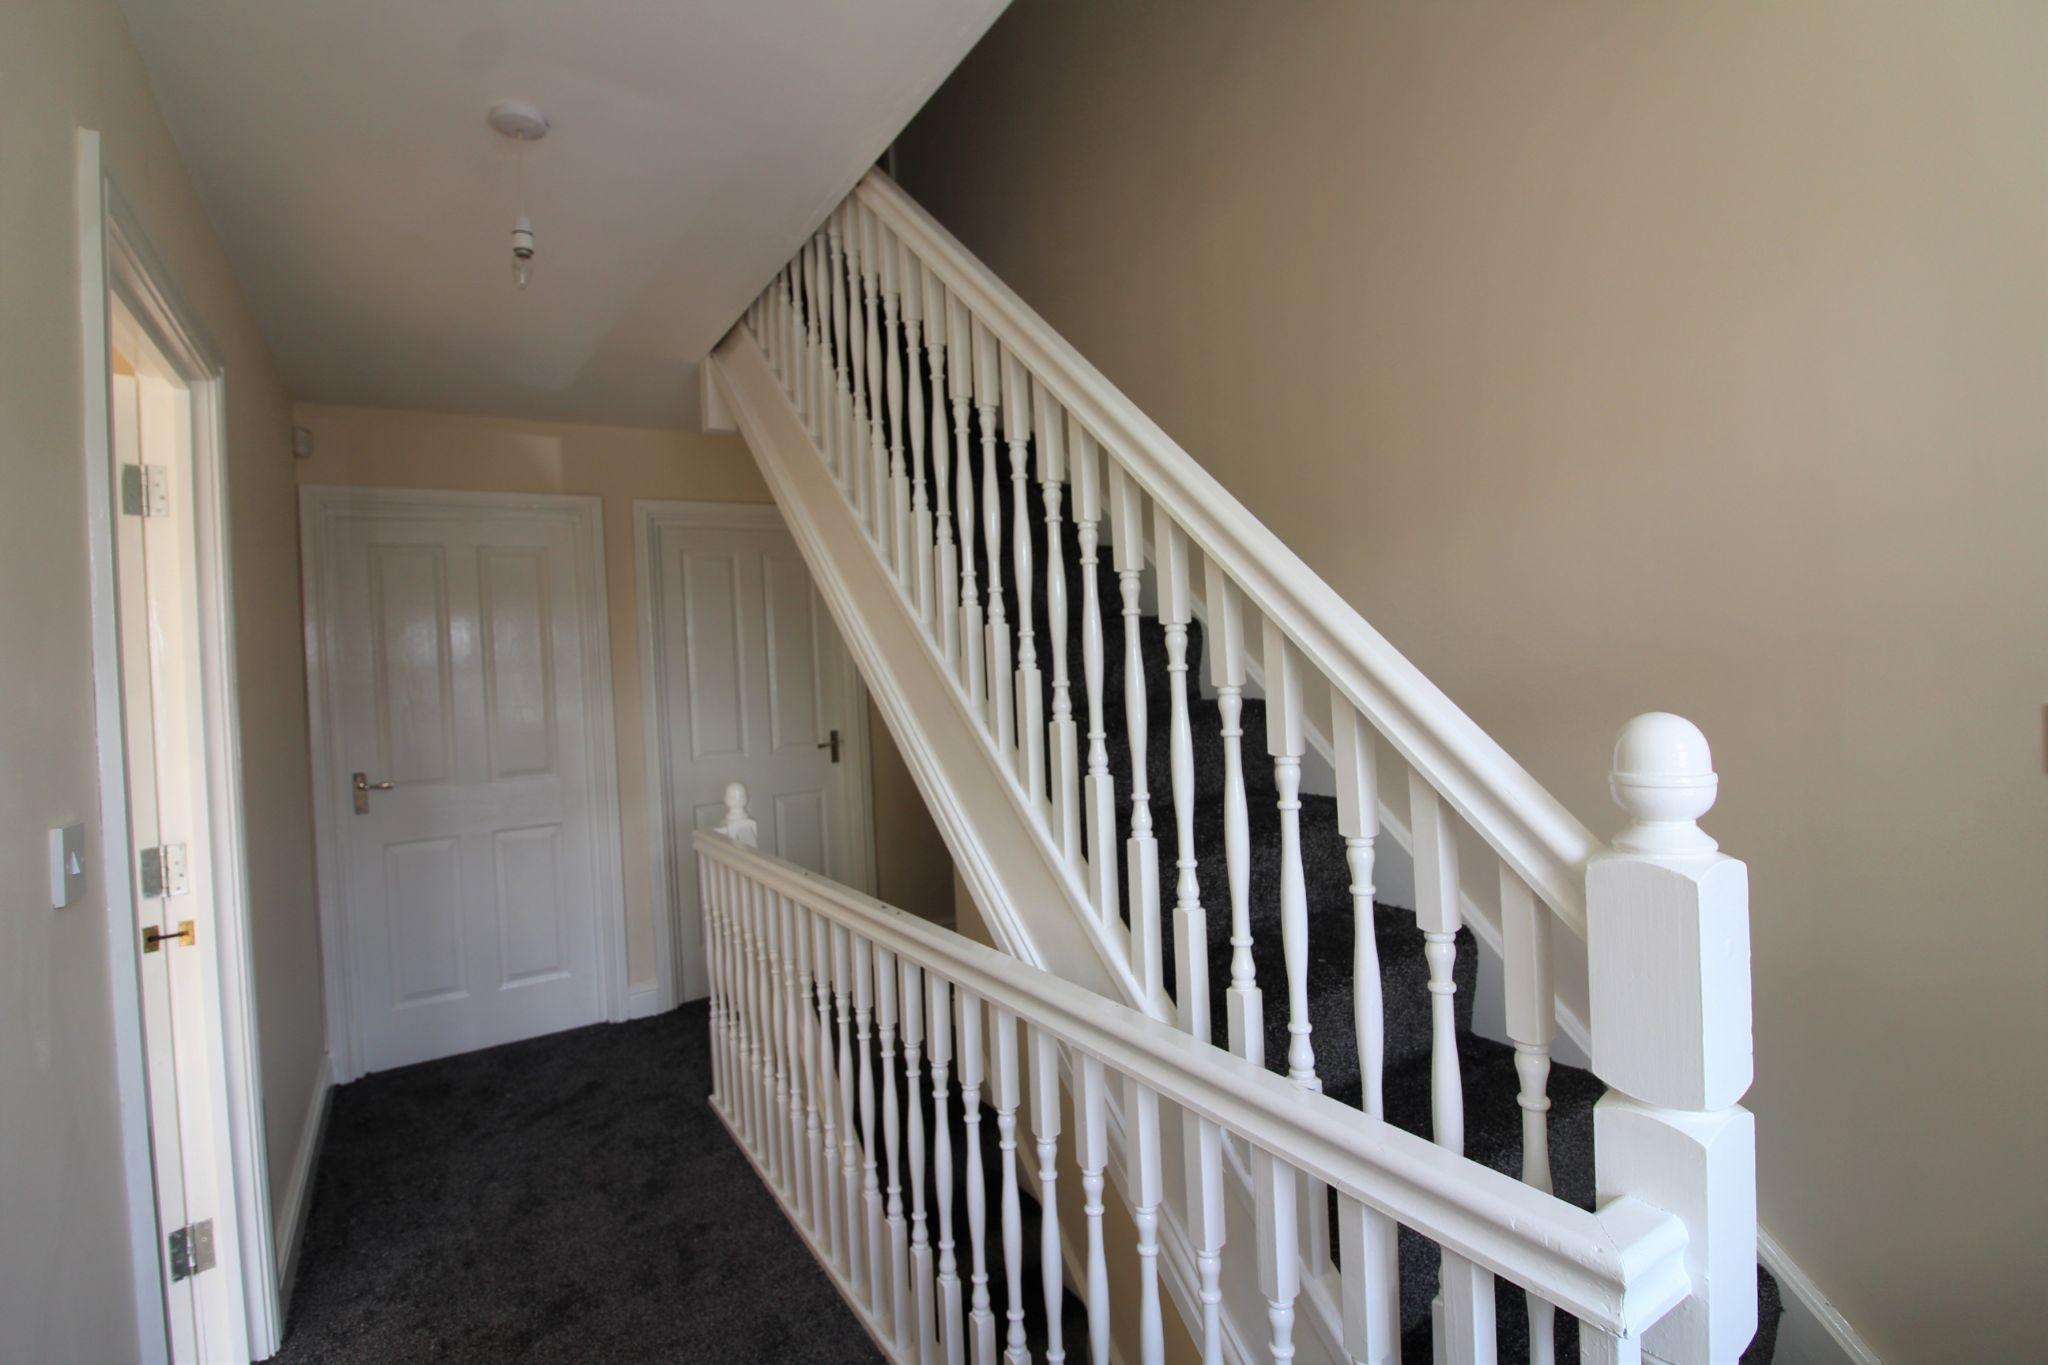 7 bedroom detached house Sale Agreed in Sunniside - Hallway to second floor.